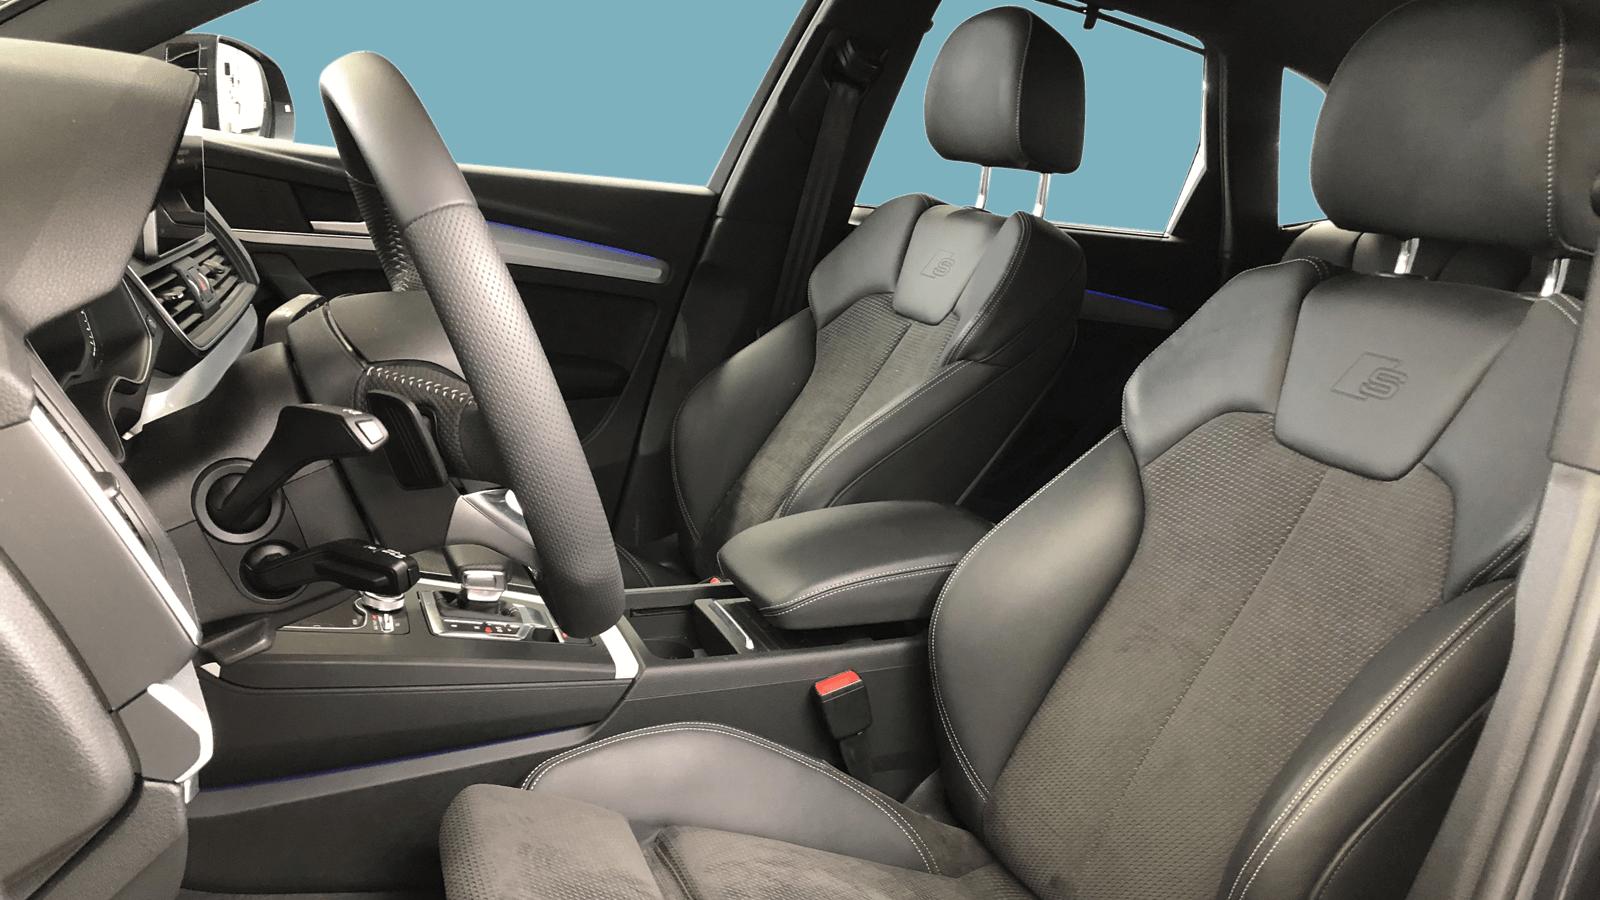 Audi Q5 Grau interior - Clyde Auto-Abo